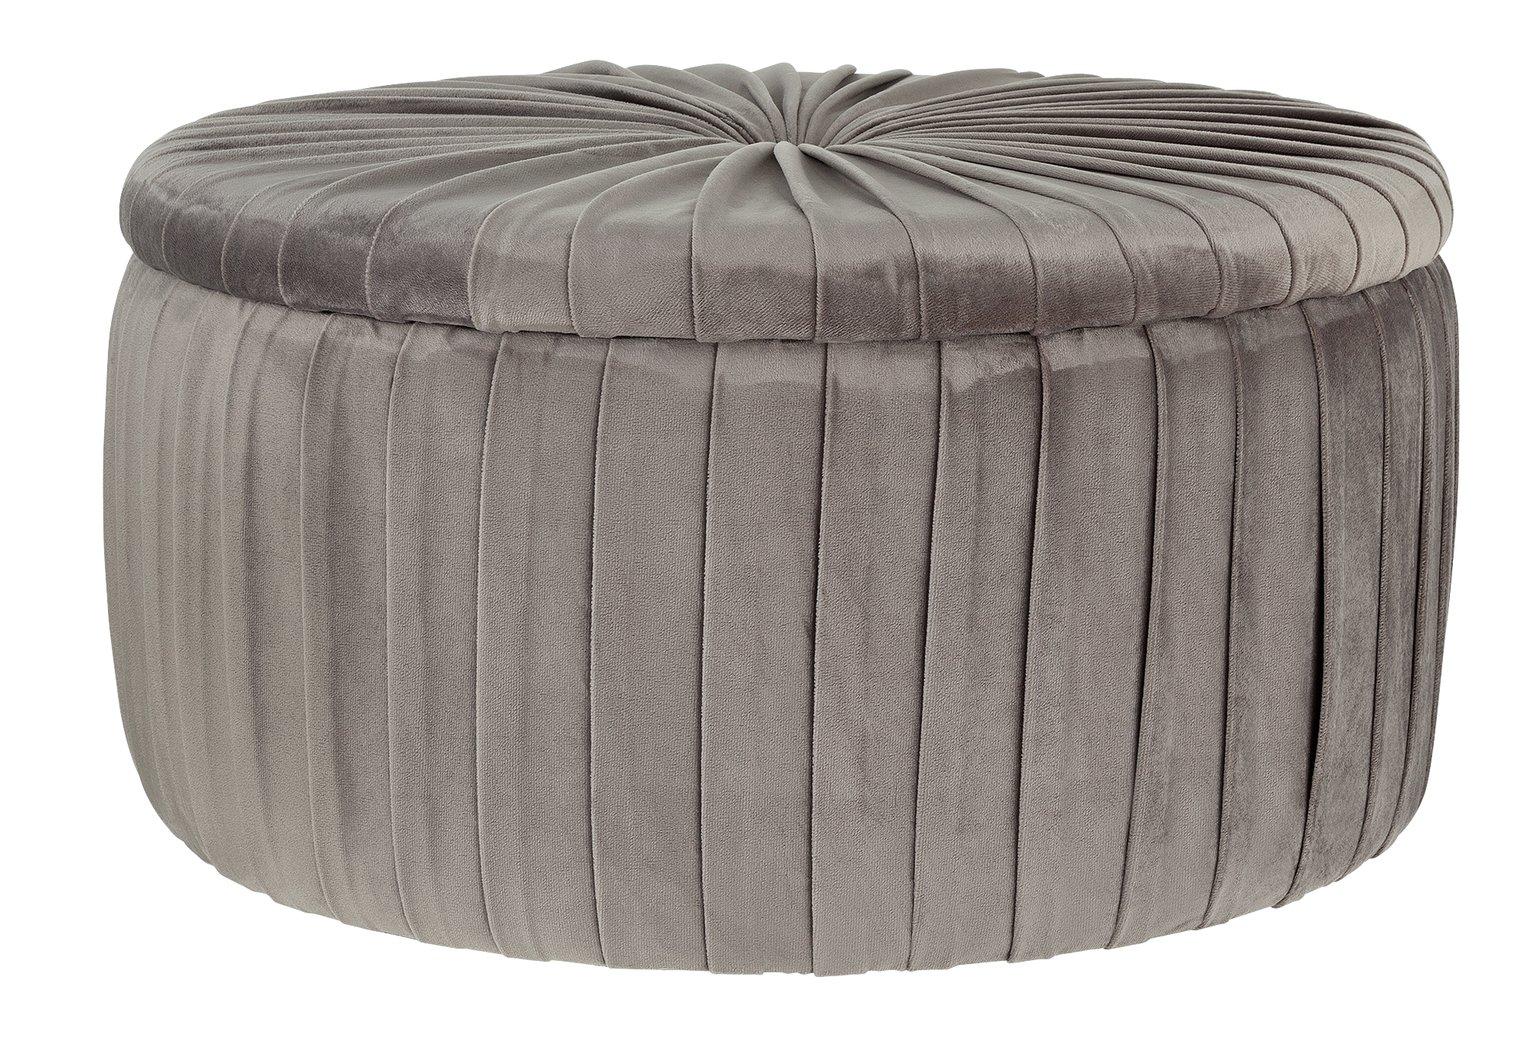 Argos Home Leckie Velvet Storage Footstool - Light Grey